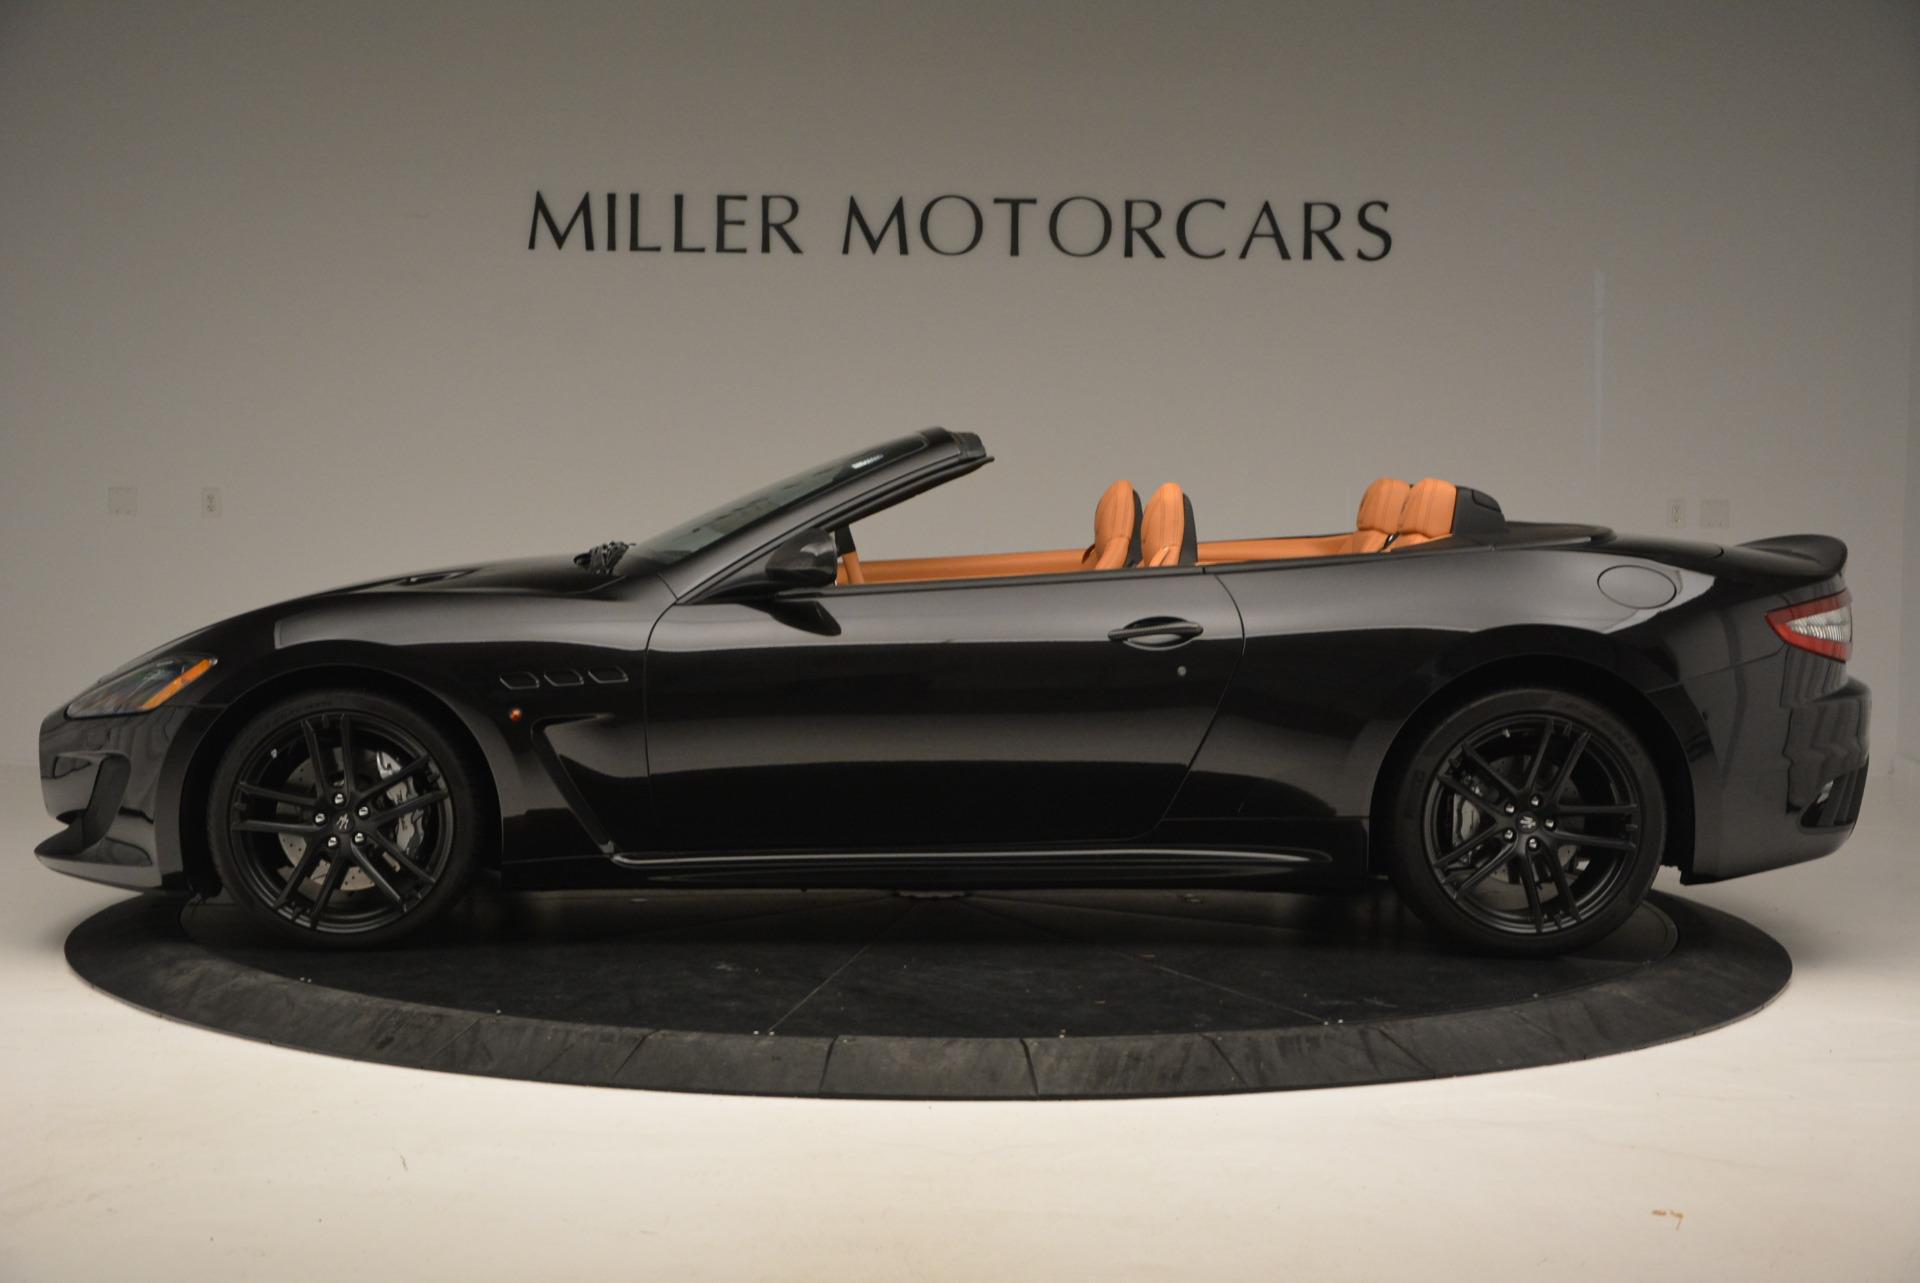 New 2017 Maserati GranTurismo MC CONVERTIBLE For Sale In Westport, CT 596_p3